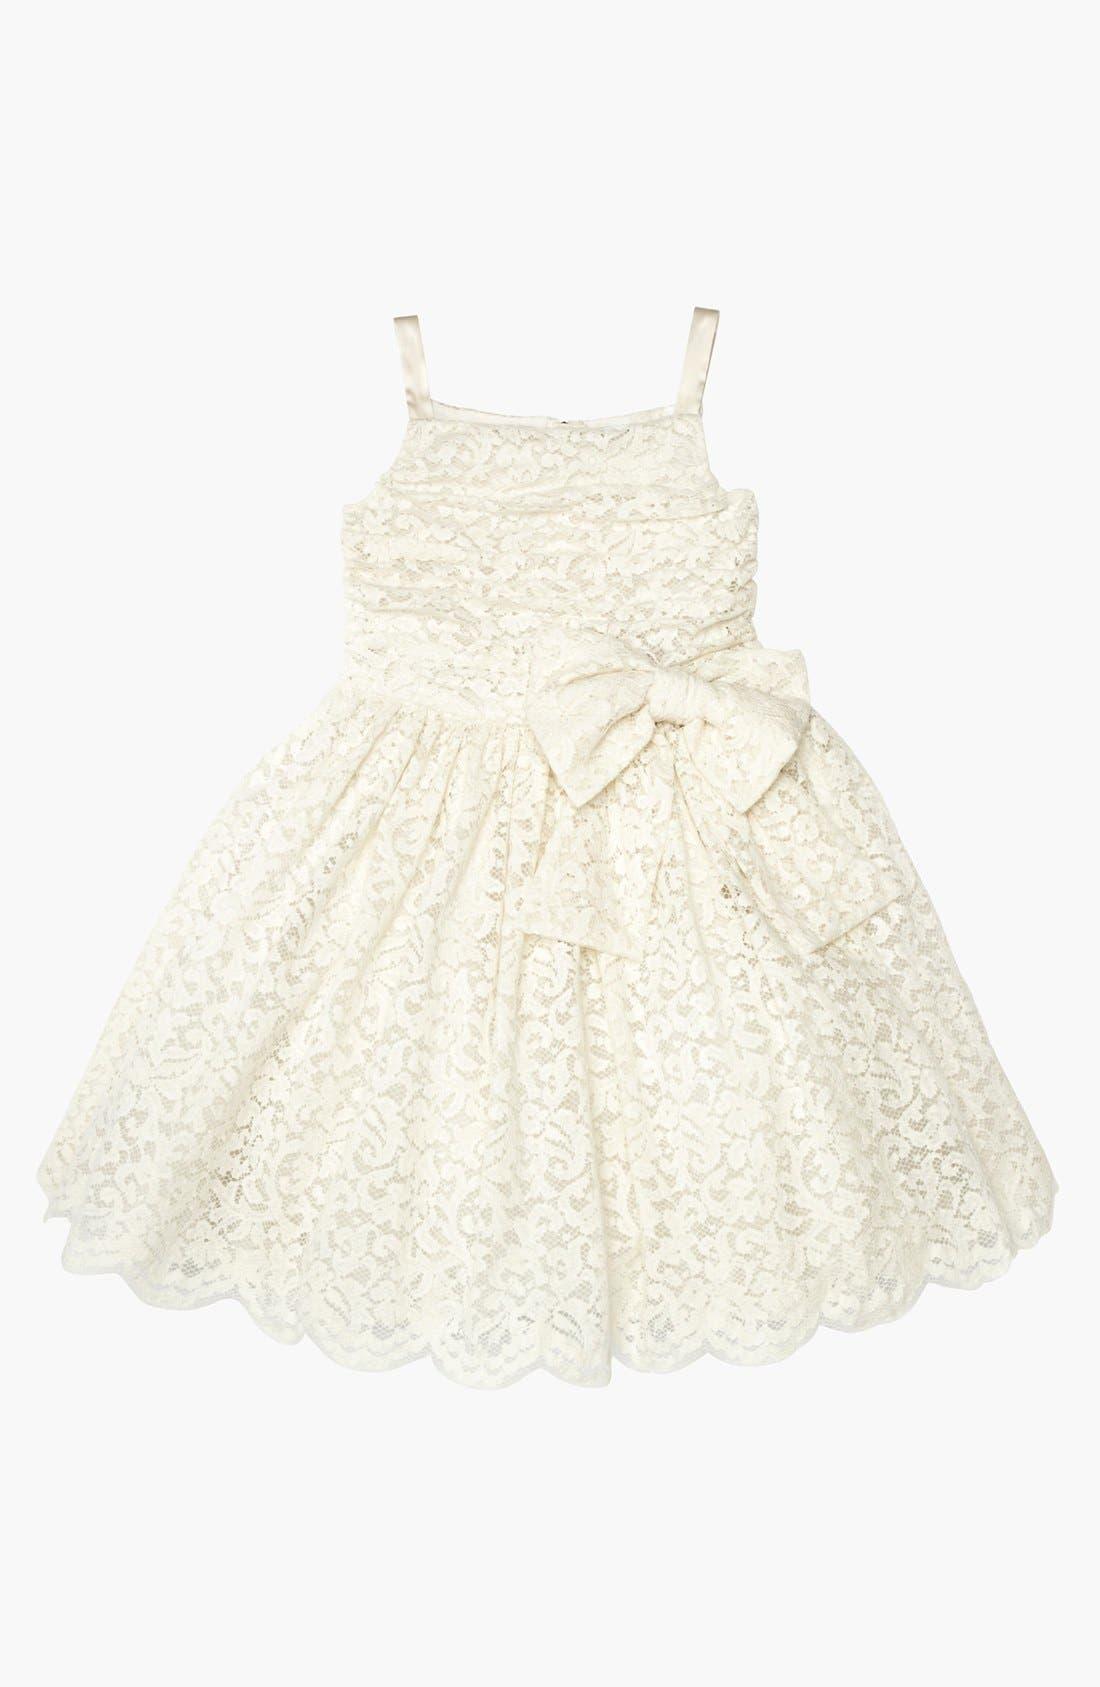 Main Image - Dolce&Gabbana Lace Party Dress (Little Girls & Big Girls)